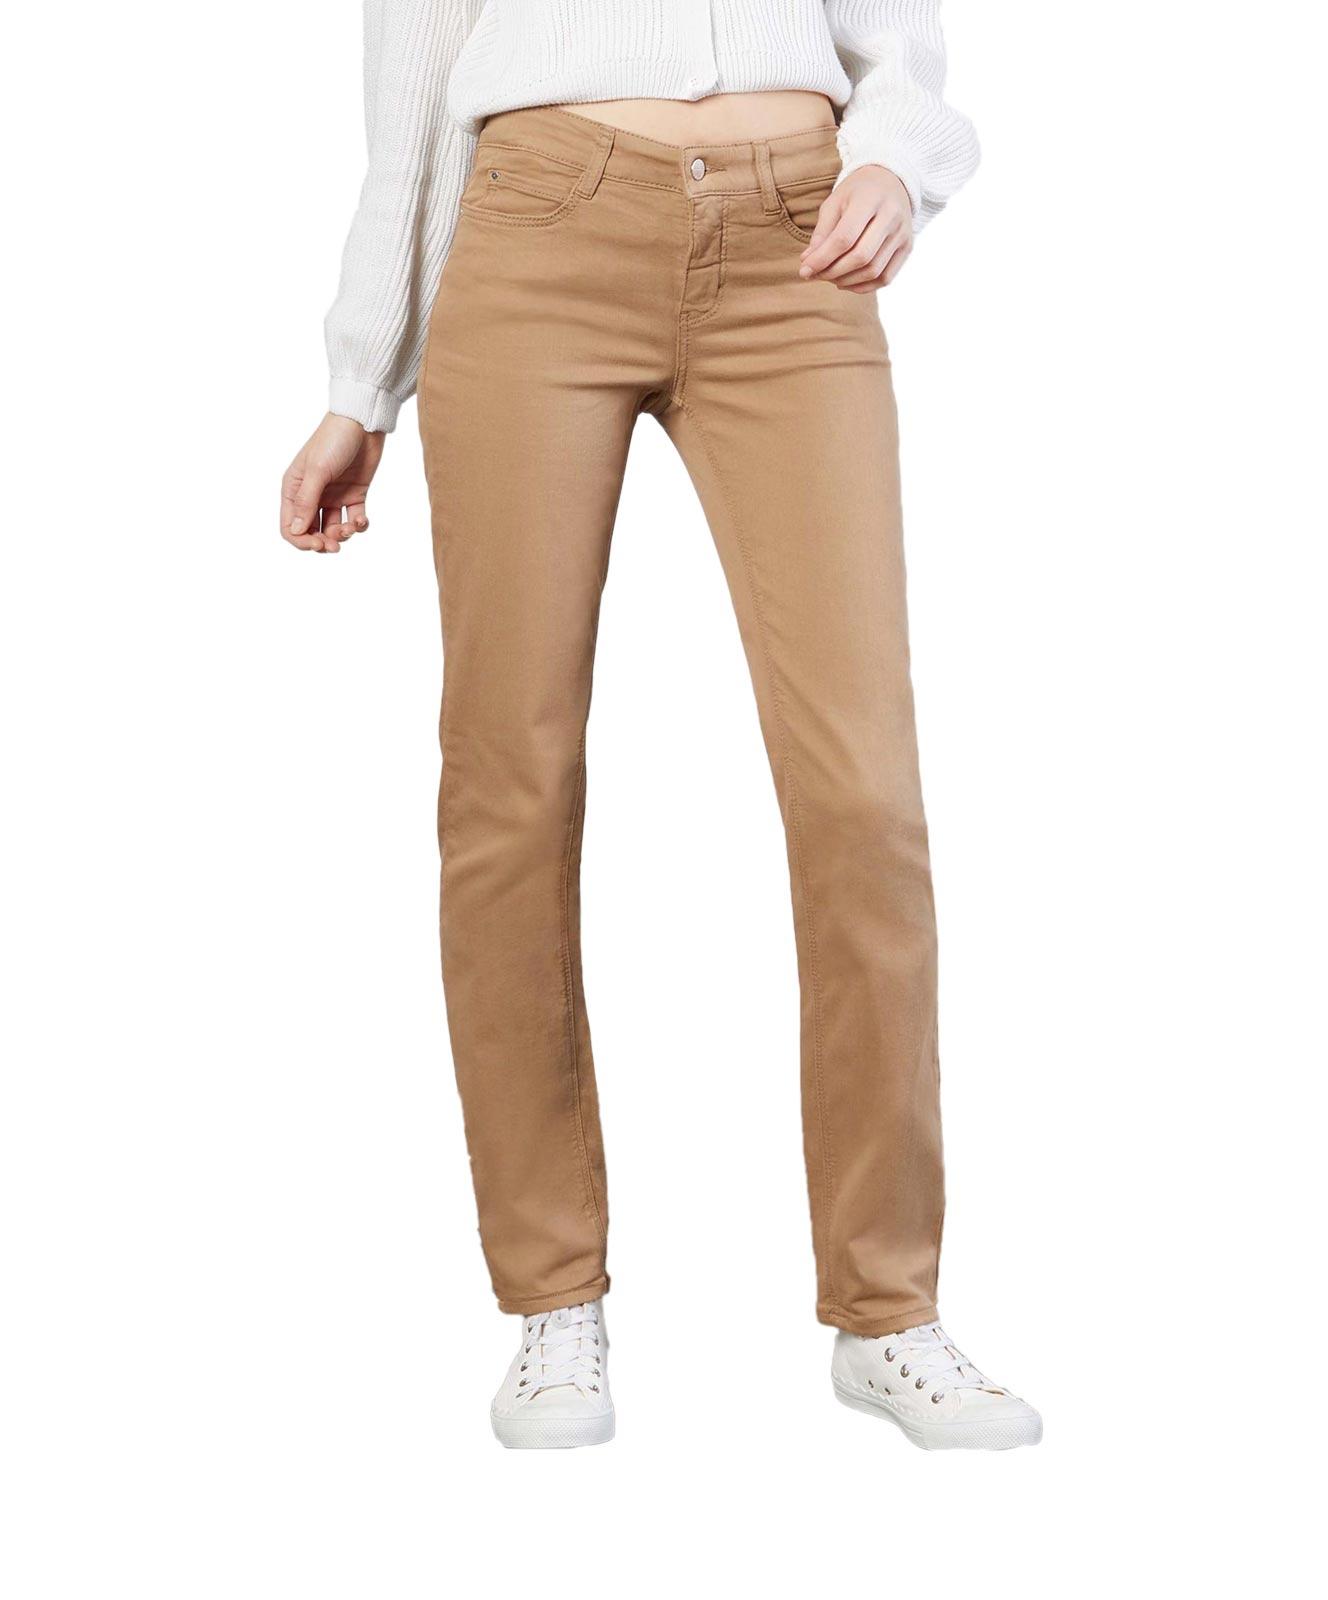 Hosen - MAC Straight Leg Jeans Dream in Light Cognac  - Onlineshop Jeans Meile